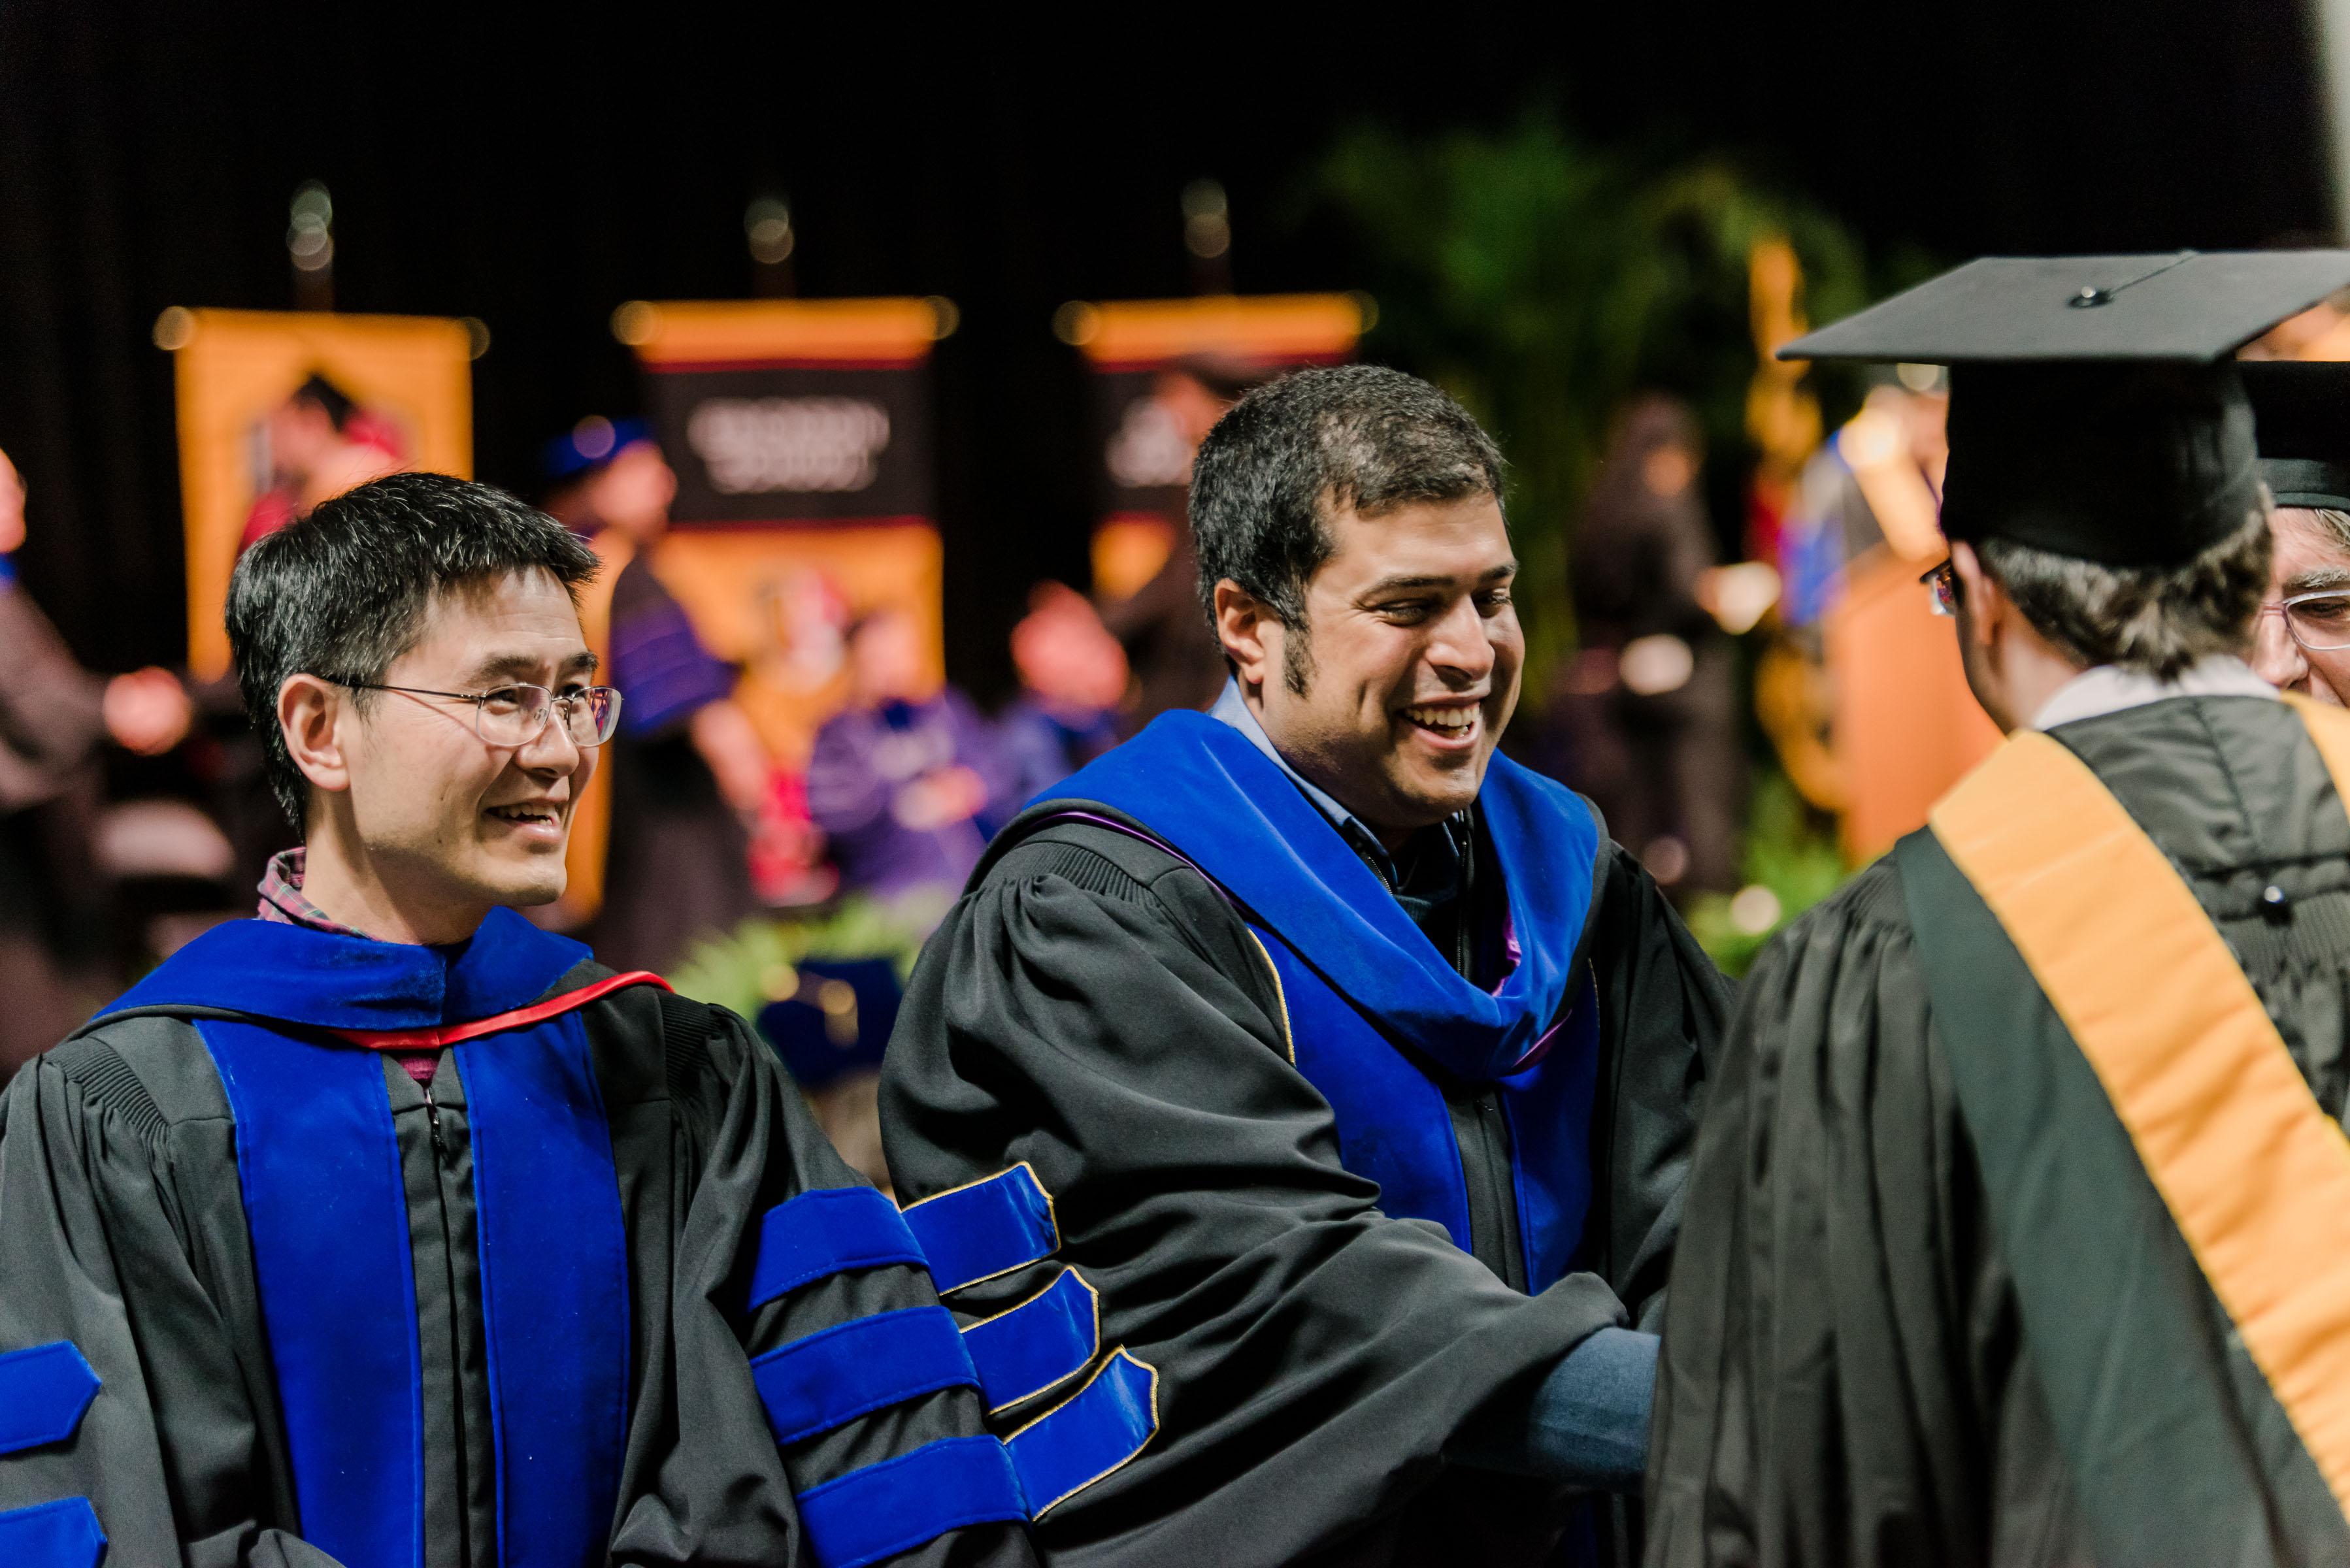 professors in graduation garb interact